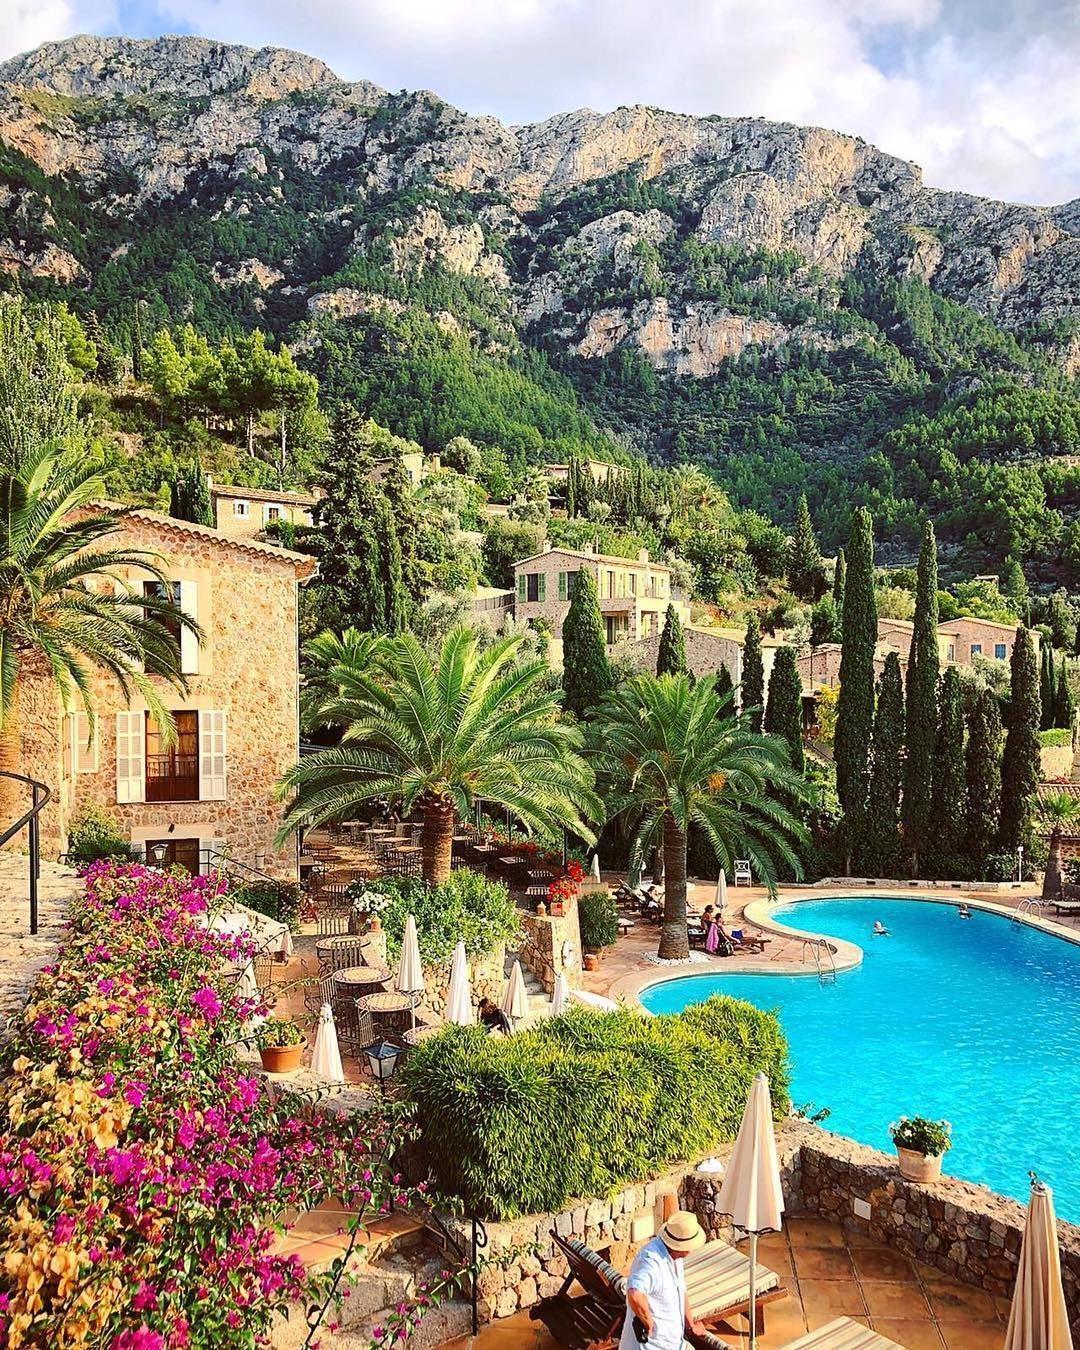 Honeymoon Destinations Rocky Mountains: Mallorca Is Giving Us That Rocky #BNHoneymoonSpot View